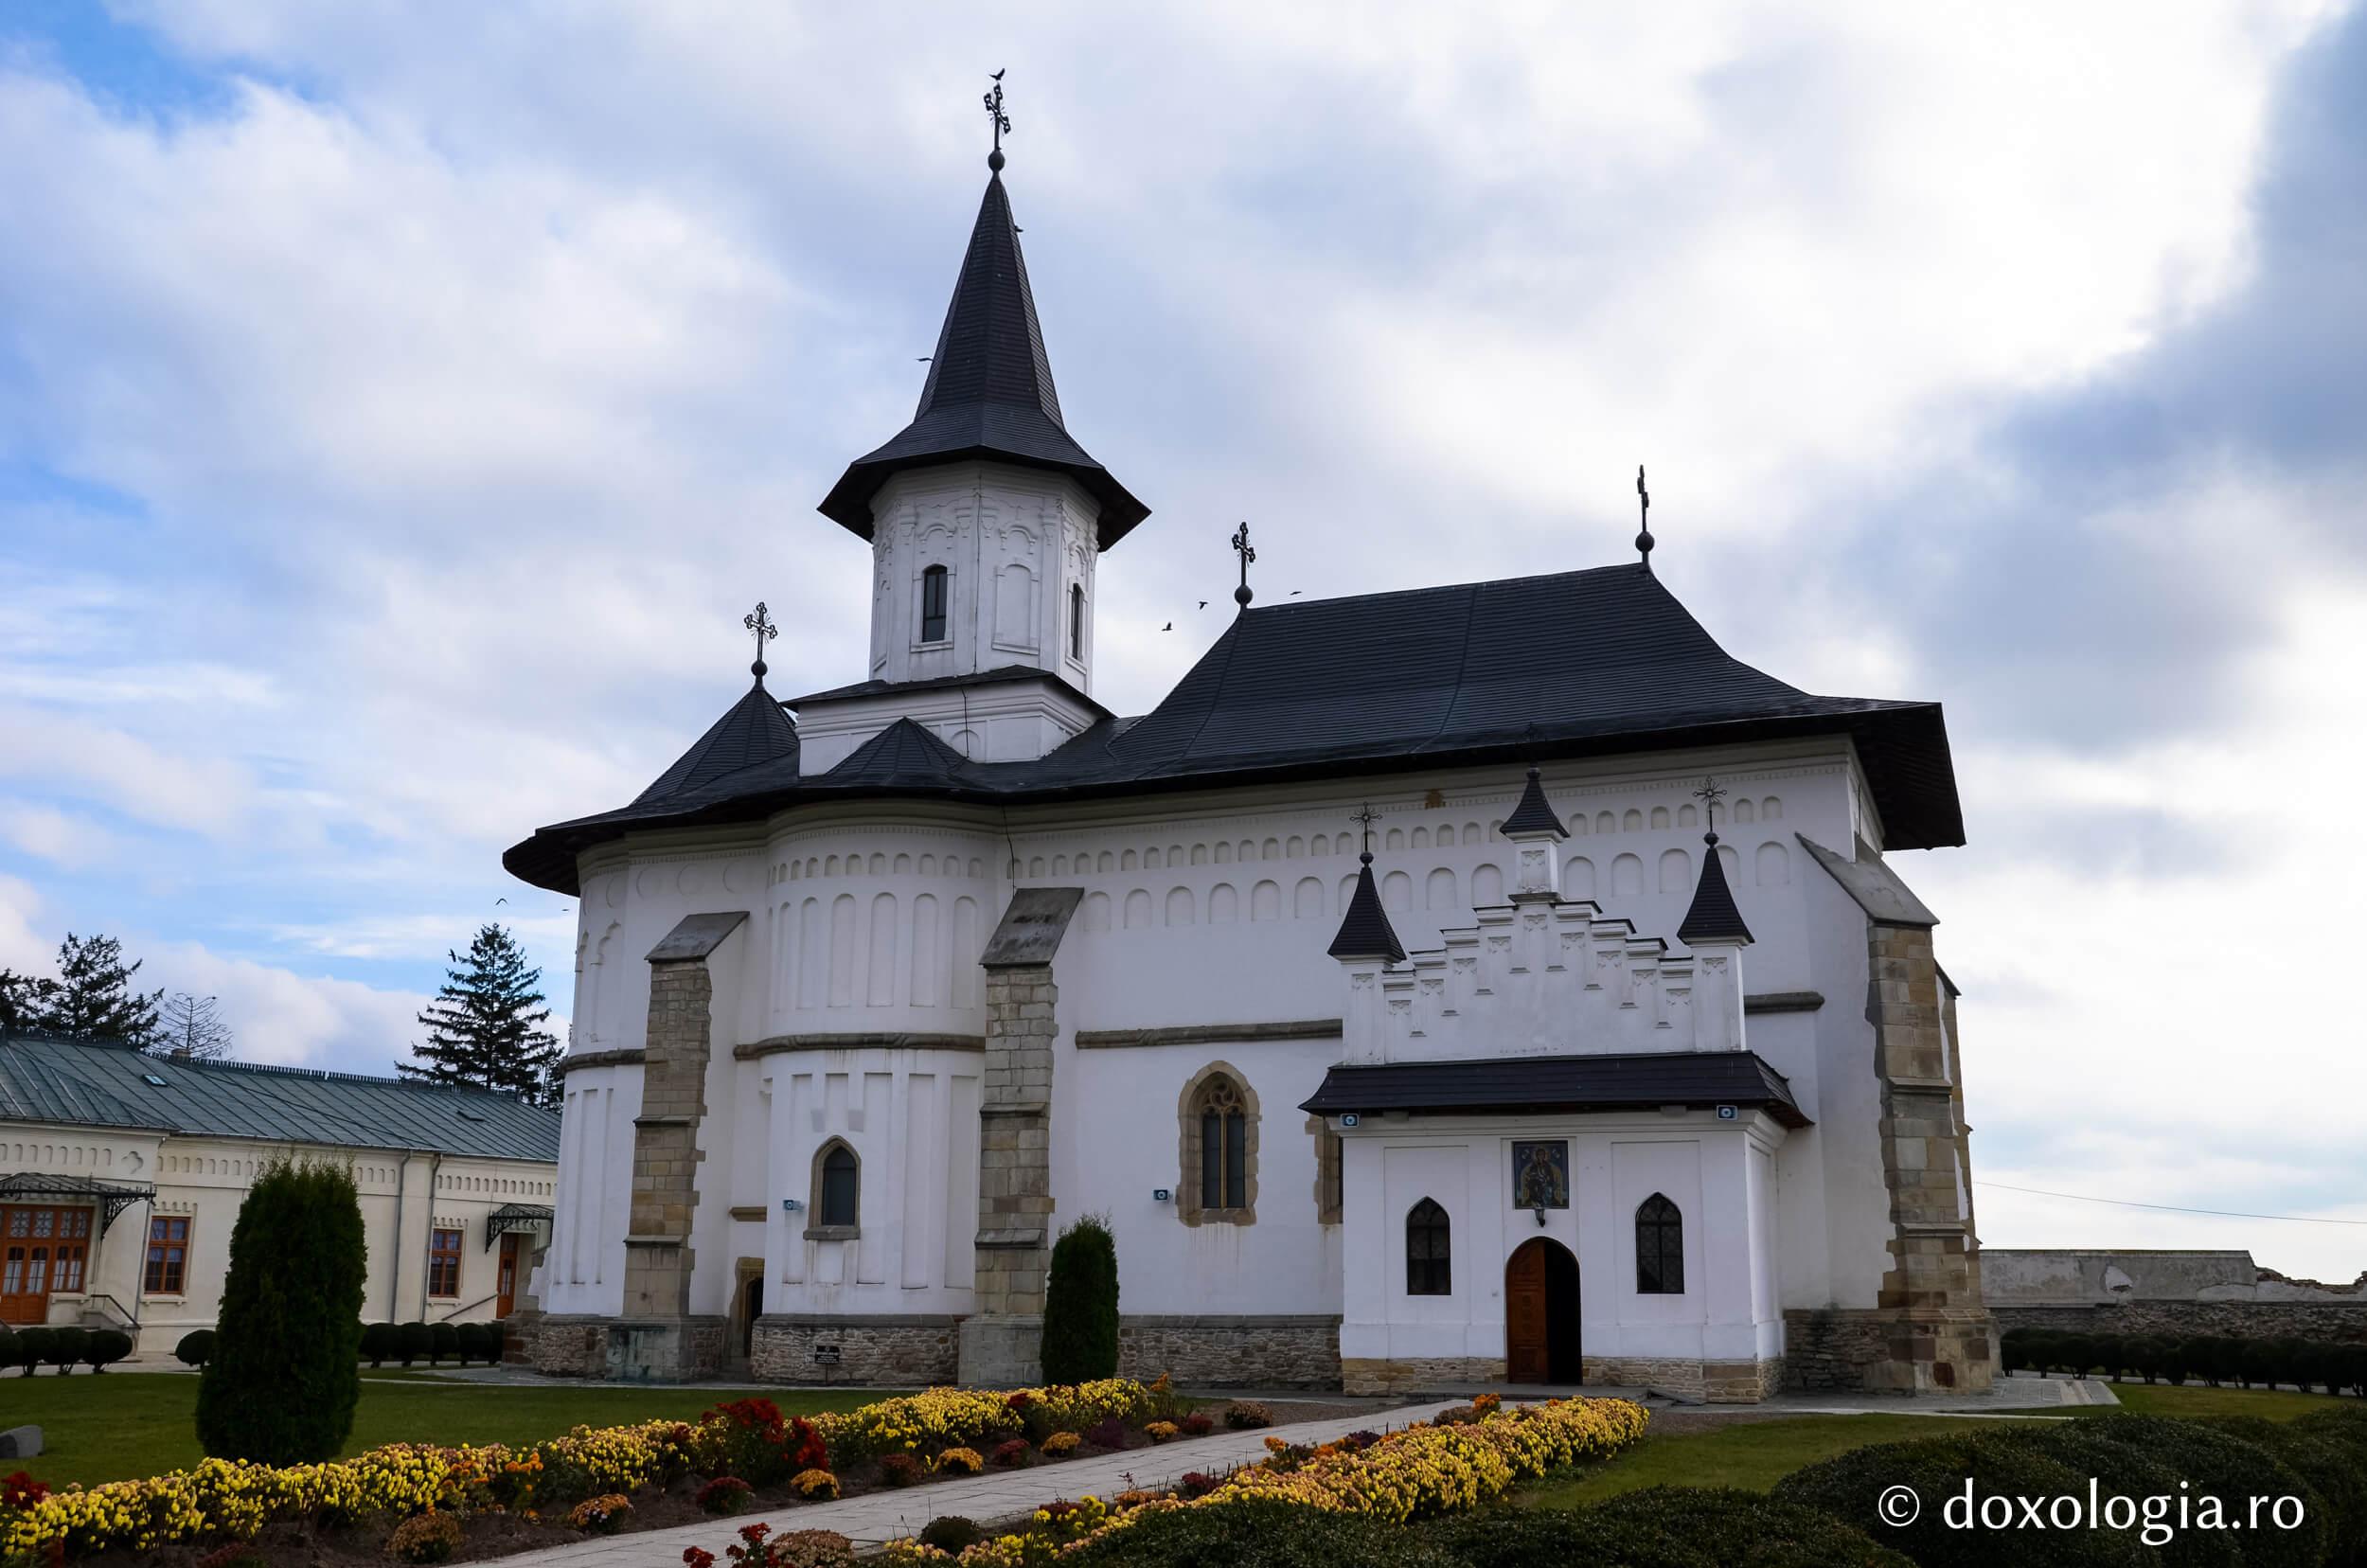 Catedrala Roman - Clement Apartments - Cazare Neamt - doxologia.ro